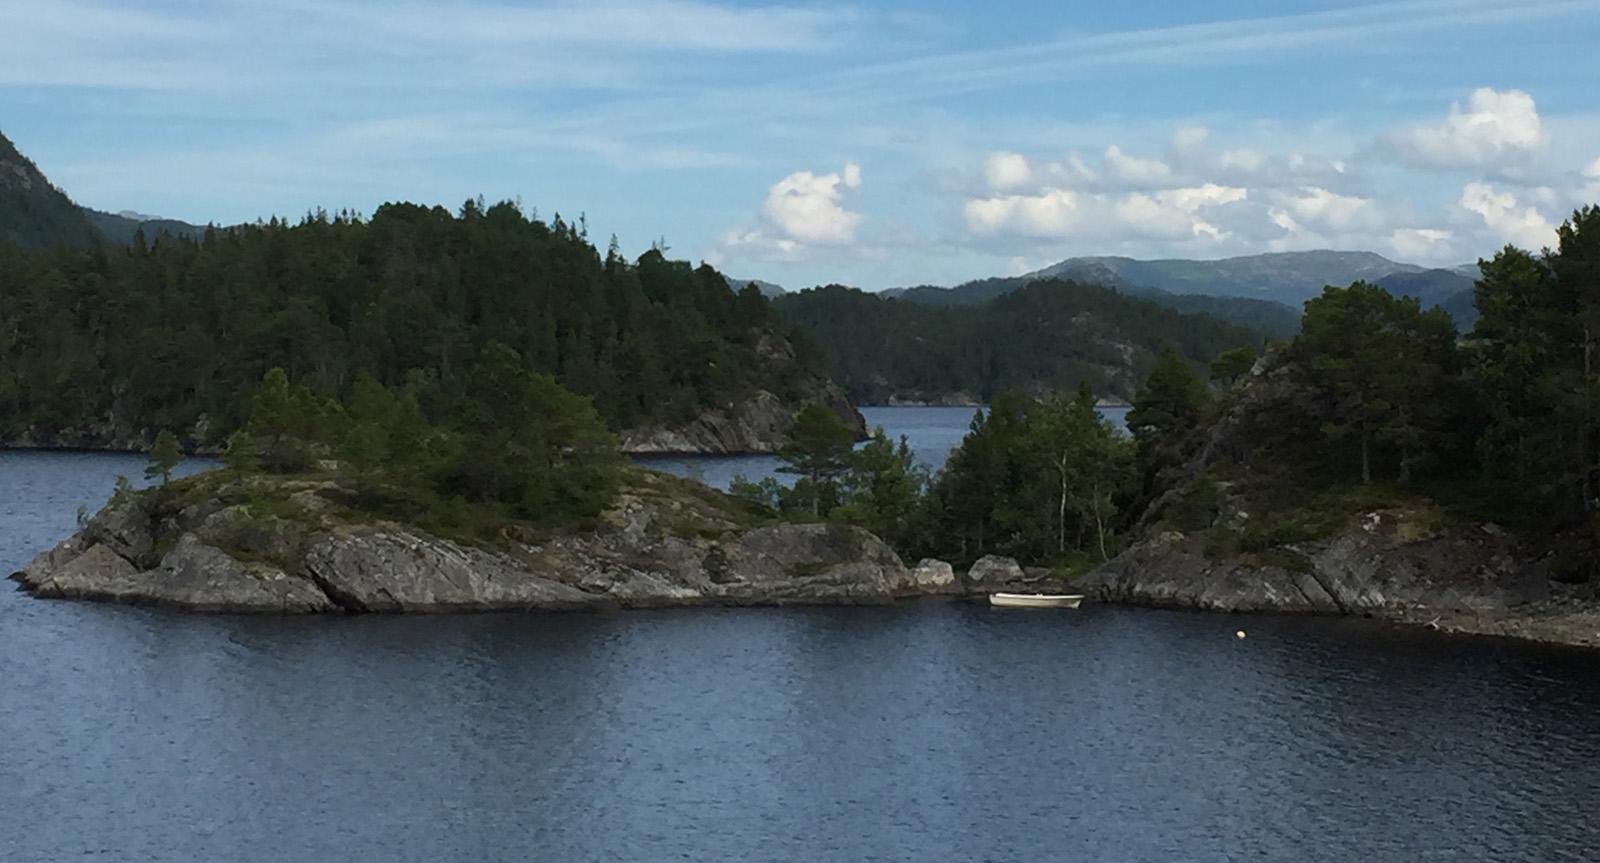 Fjorde wie Seen